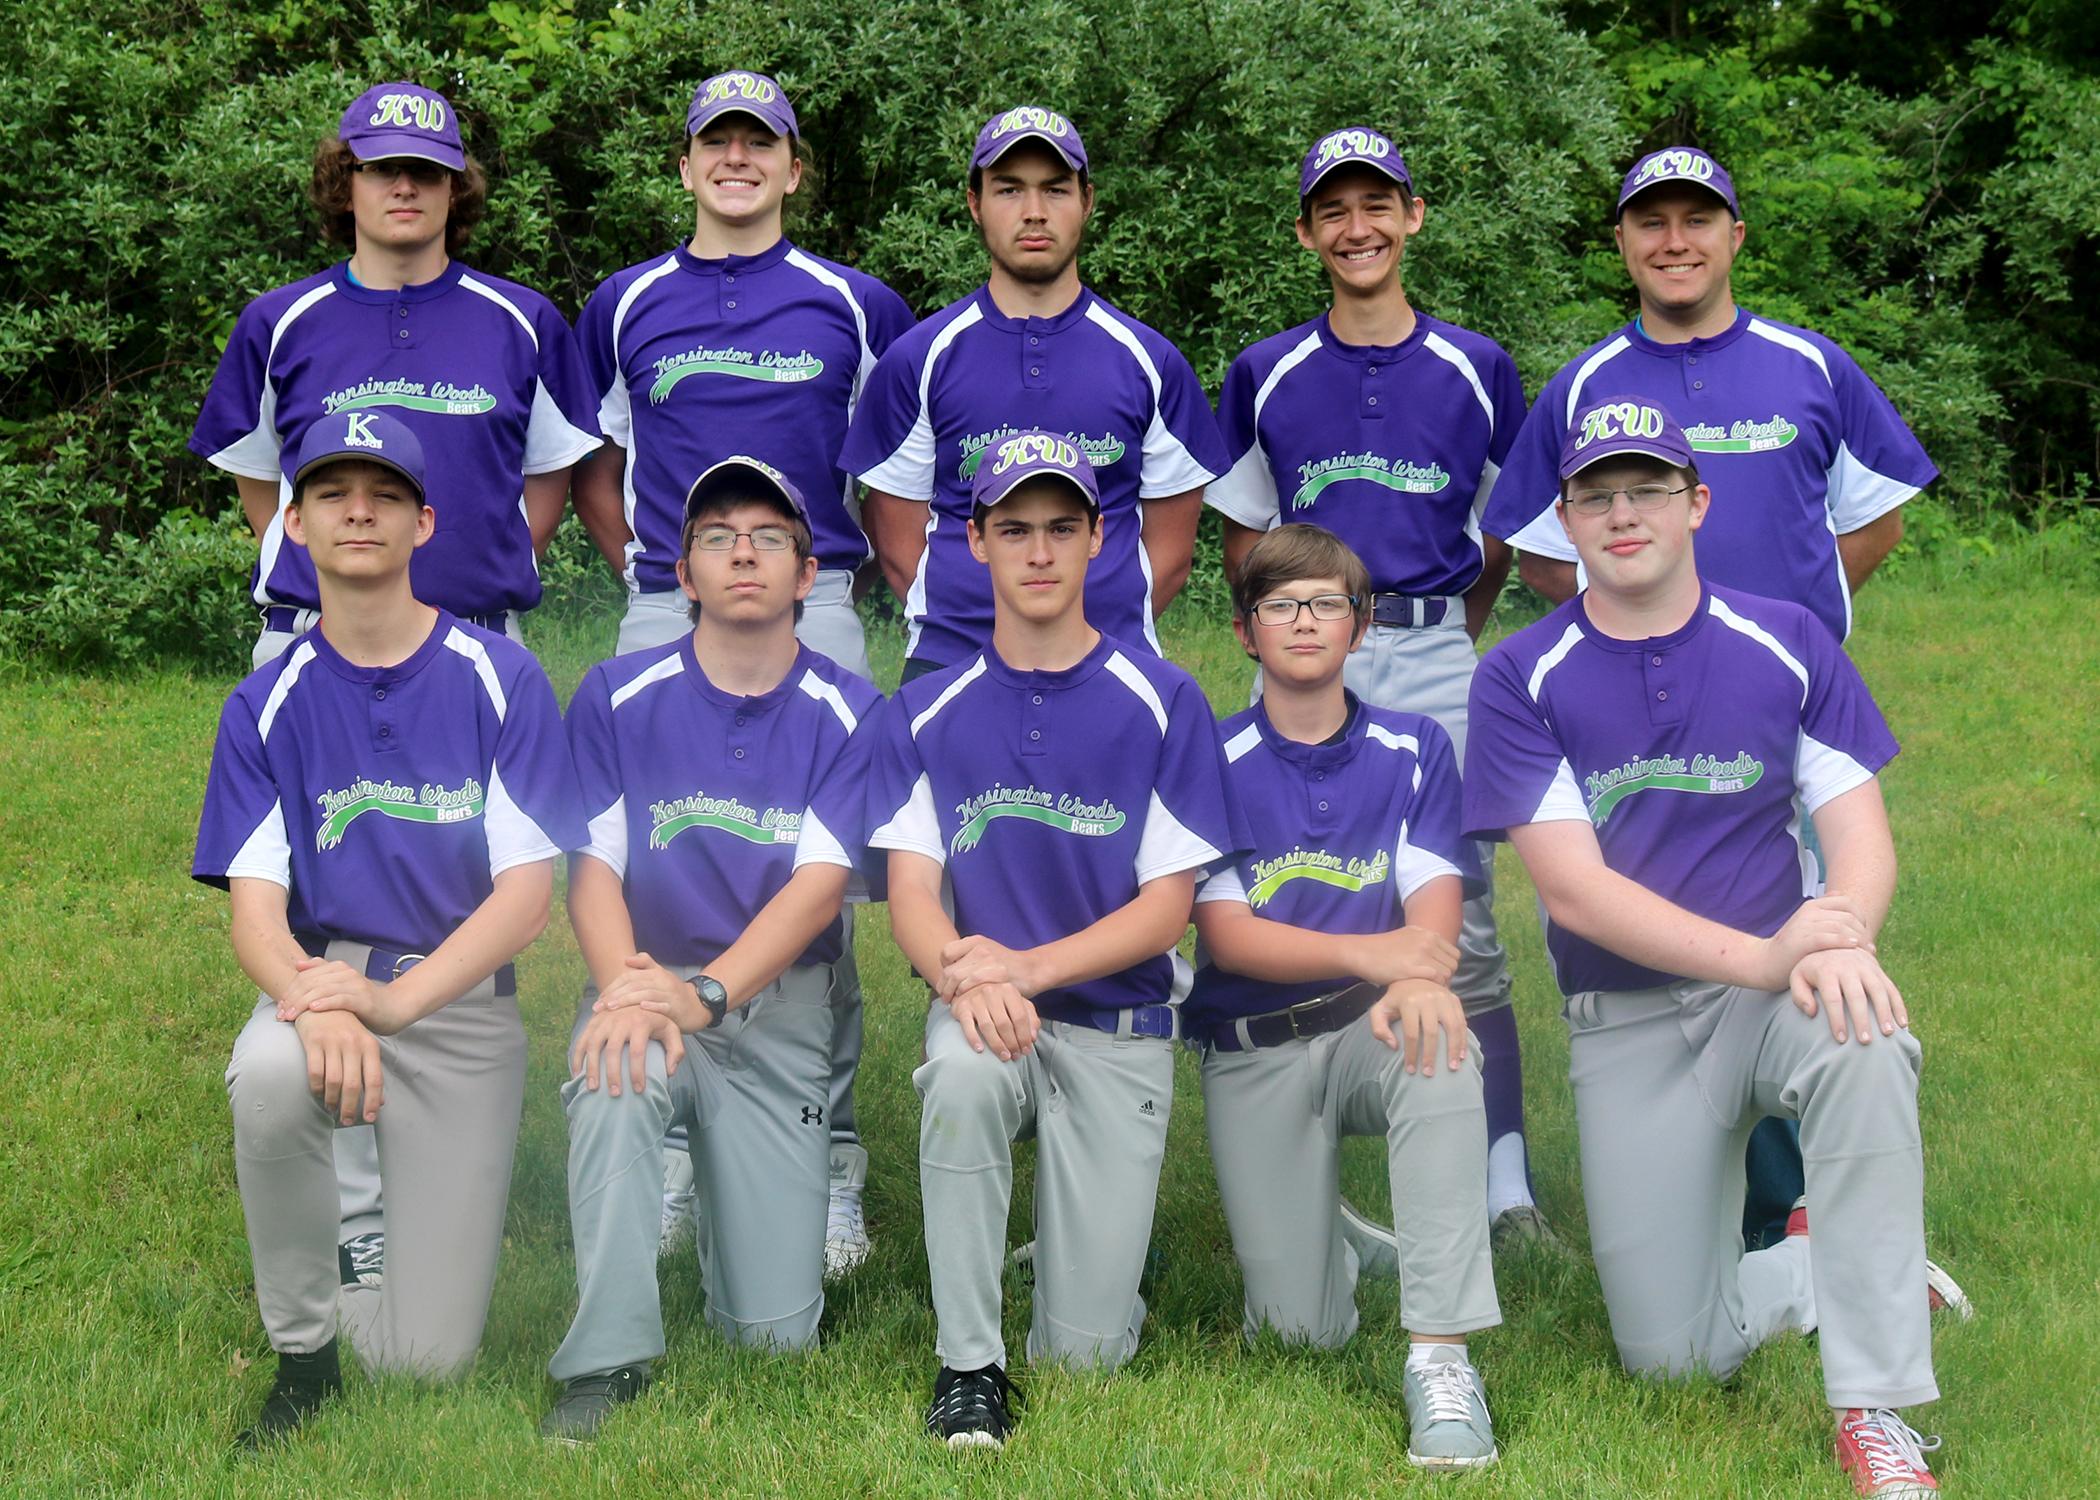 Kensington Woods Schools Baseball, 2017